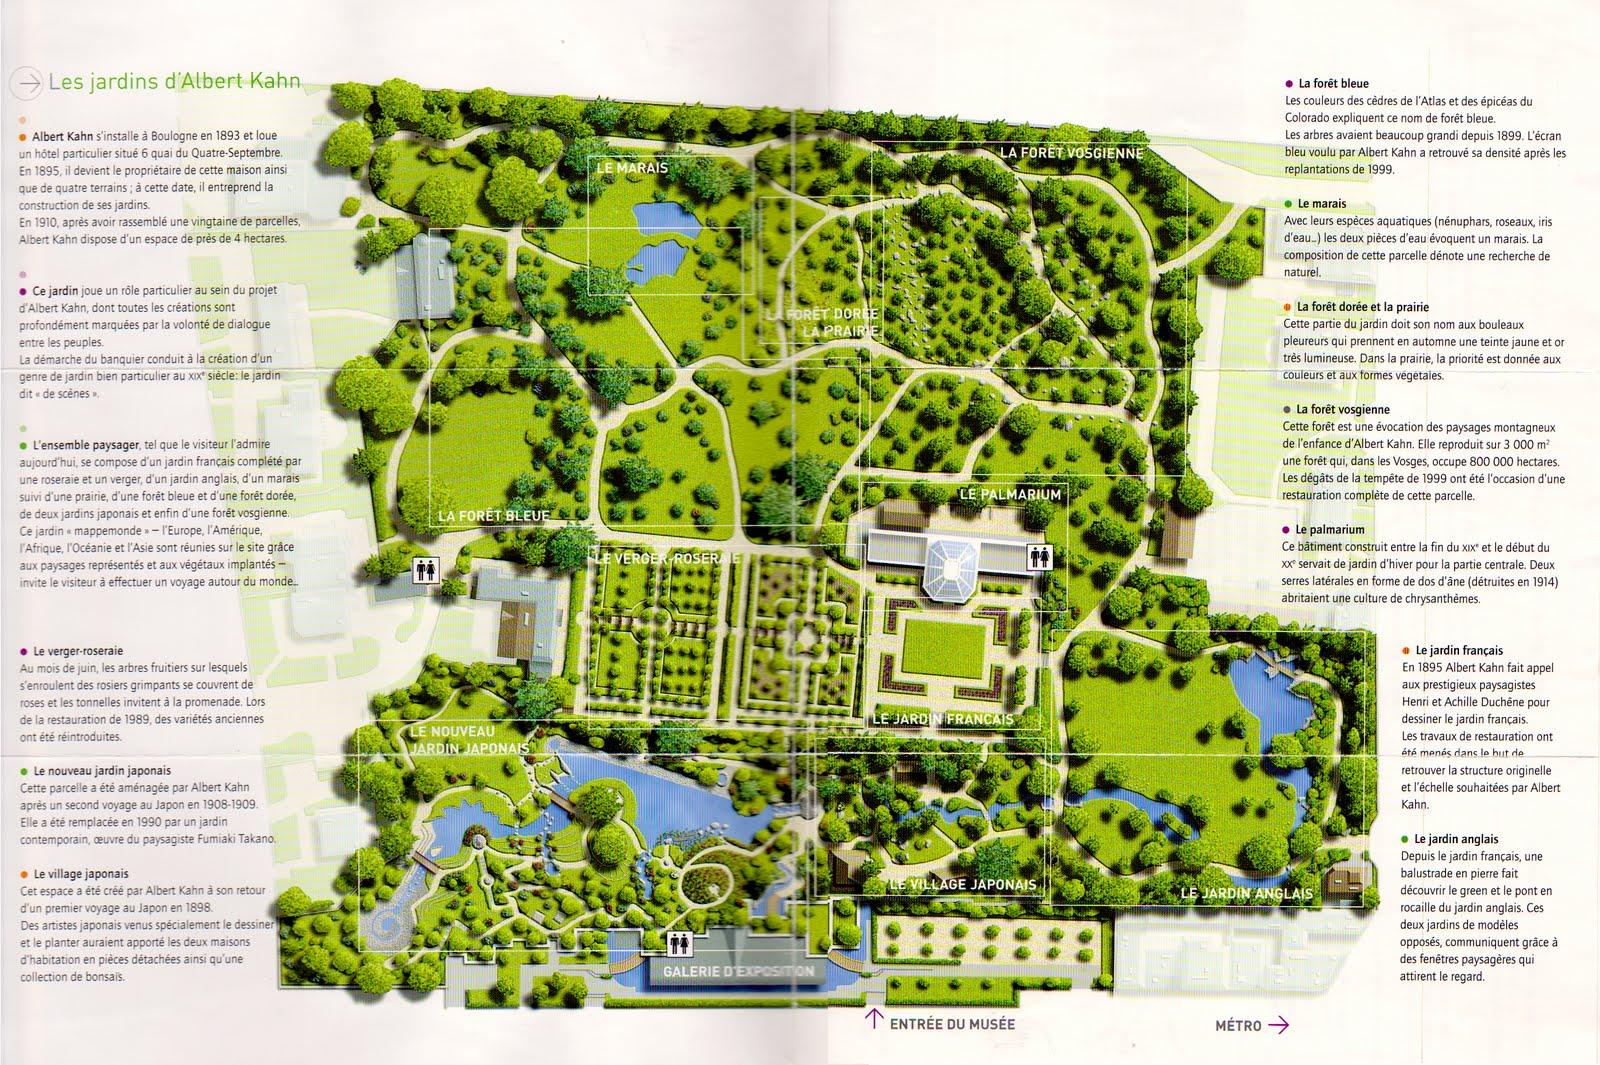 Phytospiritualit en souvenir d 39 une visite du jardin d for Albert kahn jardin